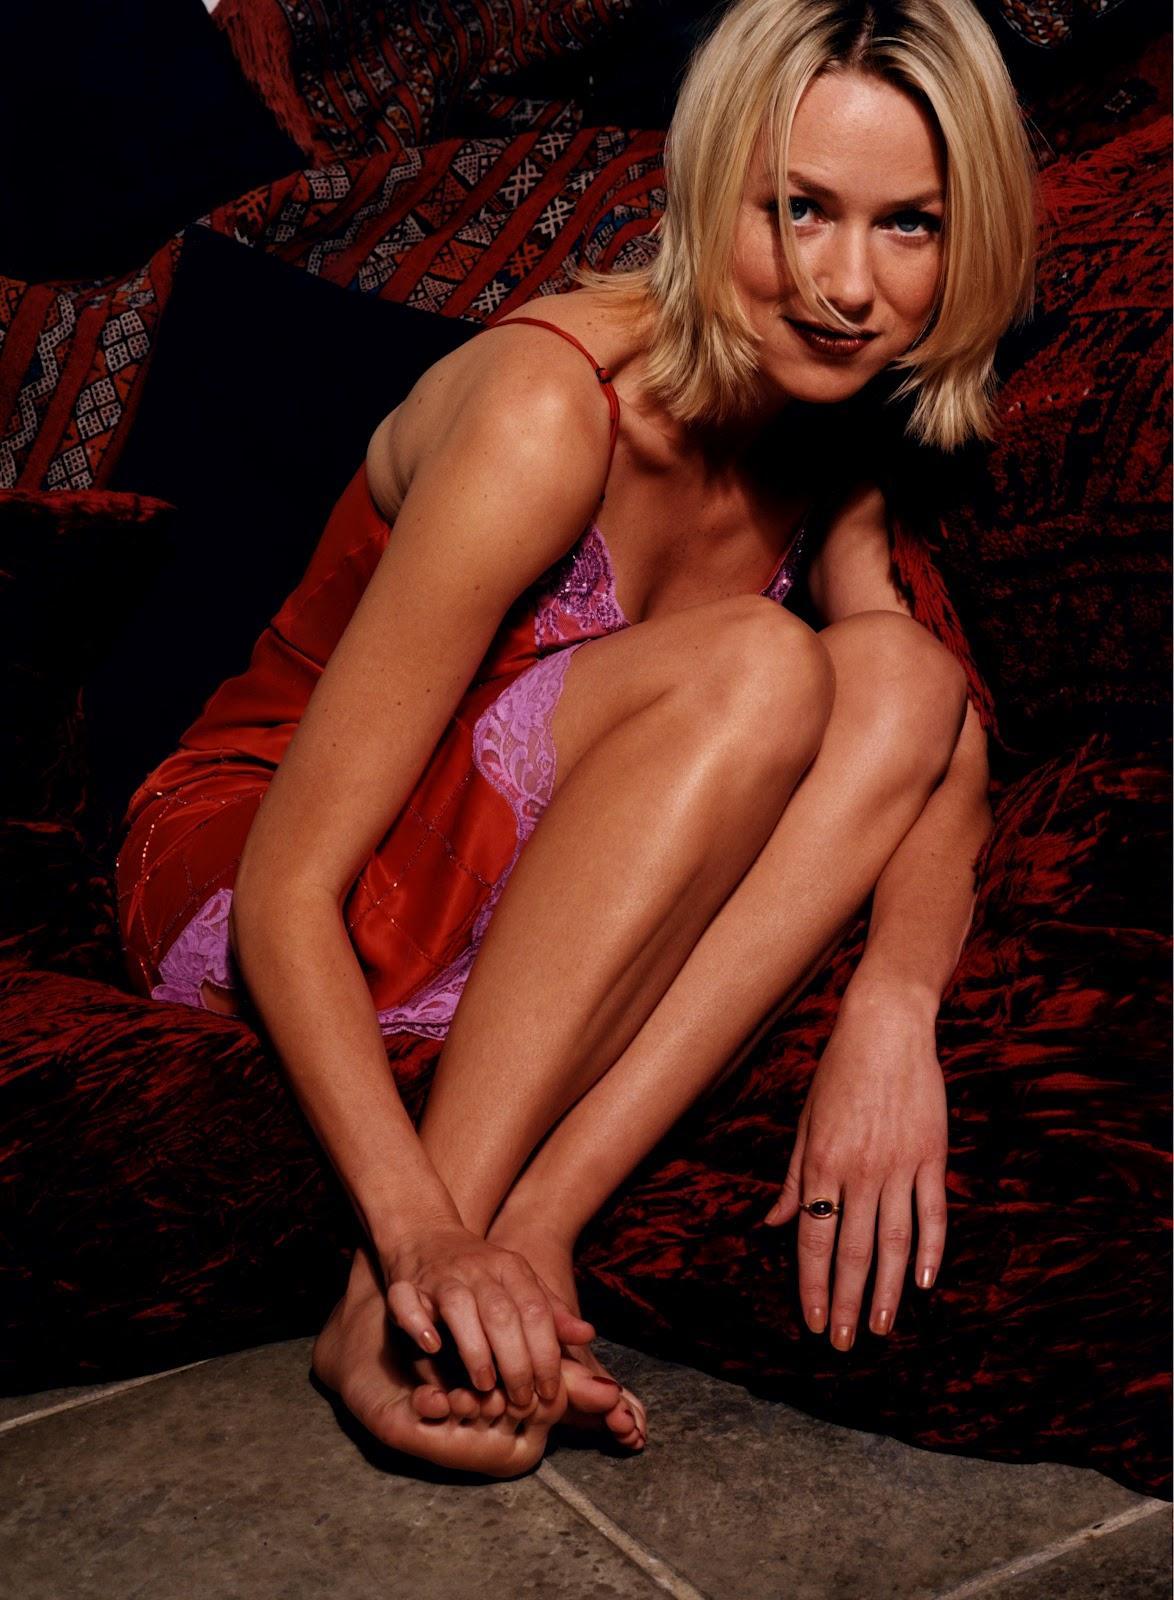 http://3.bp.blogspot.com/-71Fk43WjGqU/T_RQfDOVAHI/AAAAAAAACa0/Xep8ZLKBA3Q/s1600/Naomi-Watts-Feet-65068.jpg